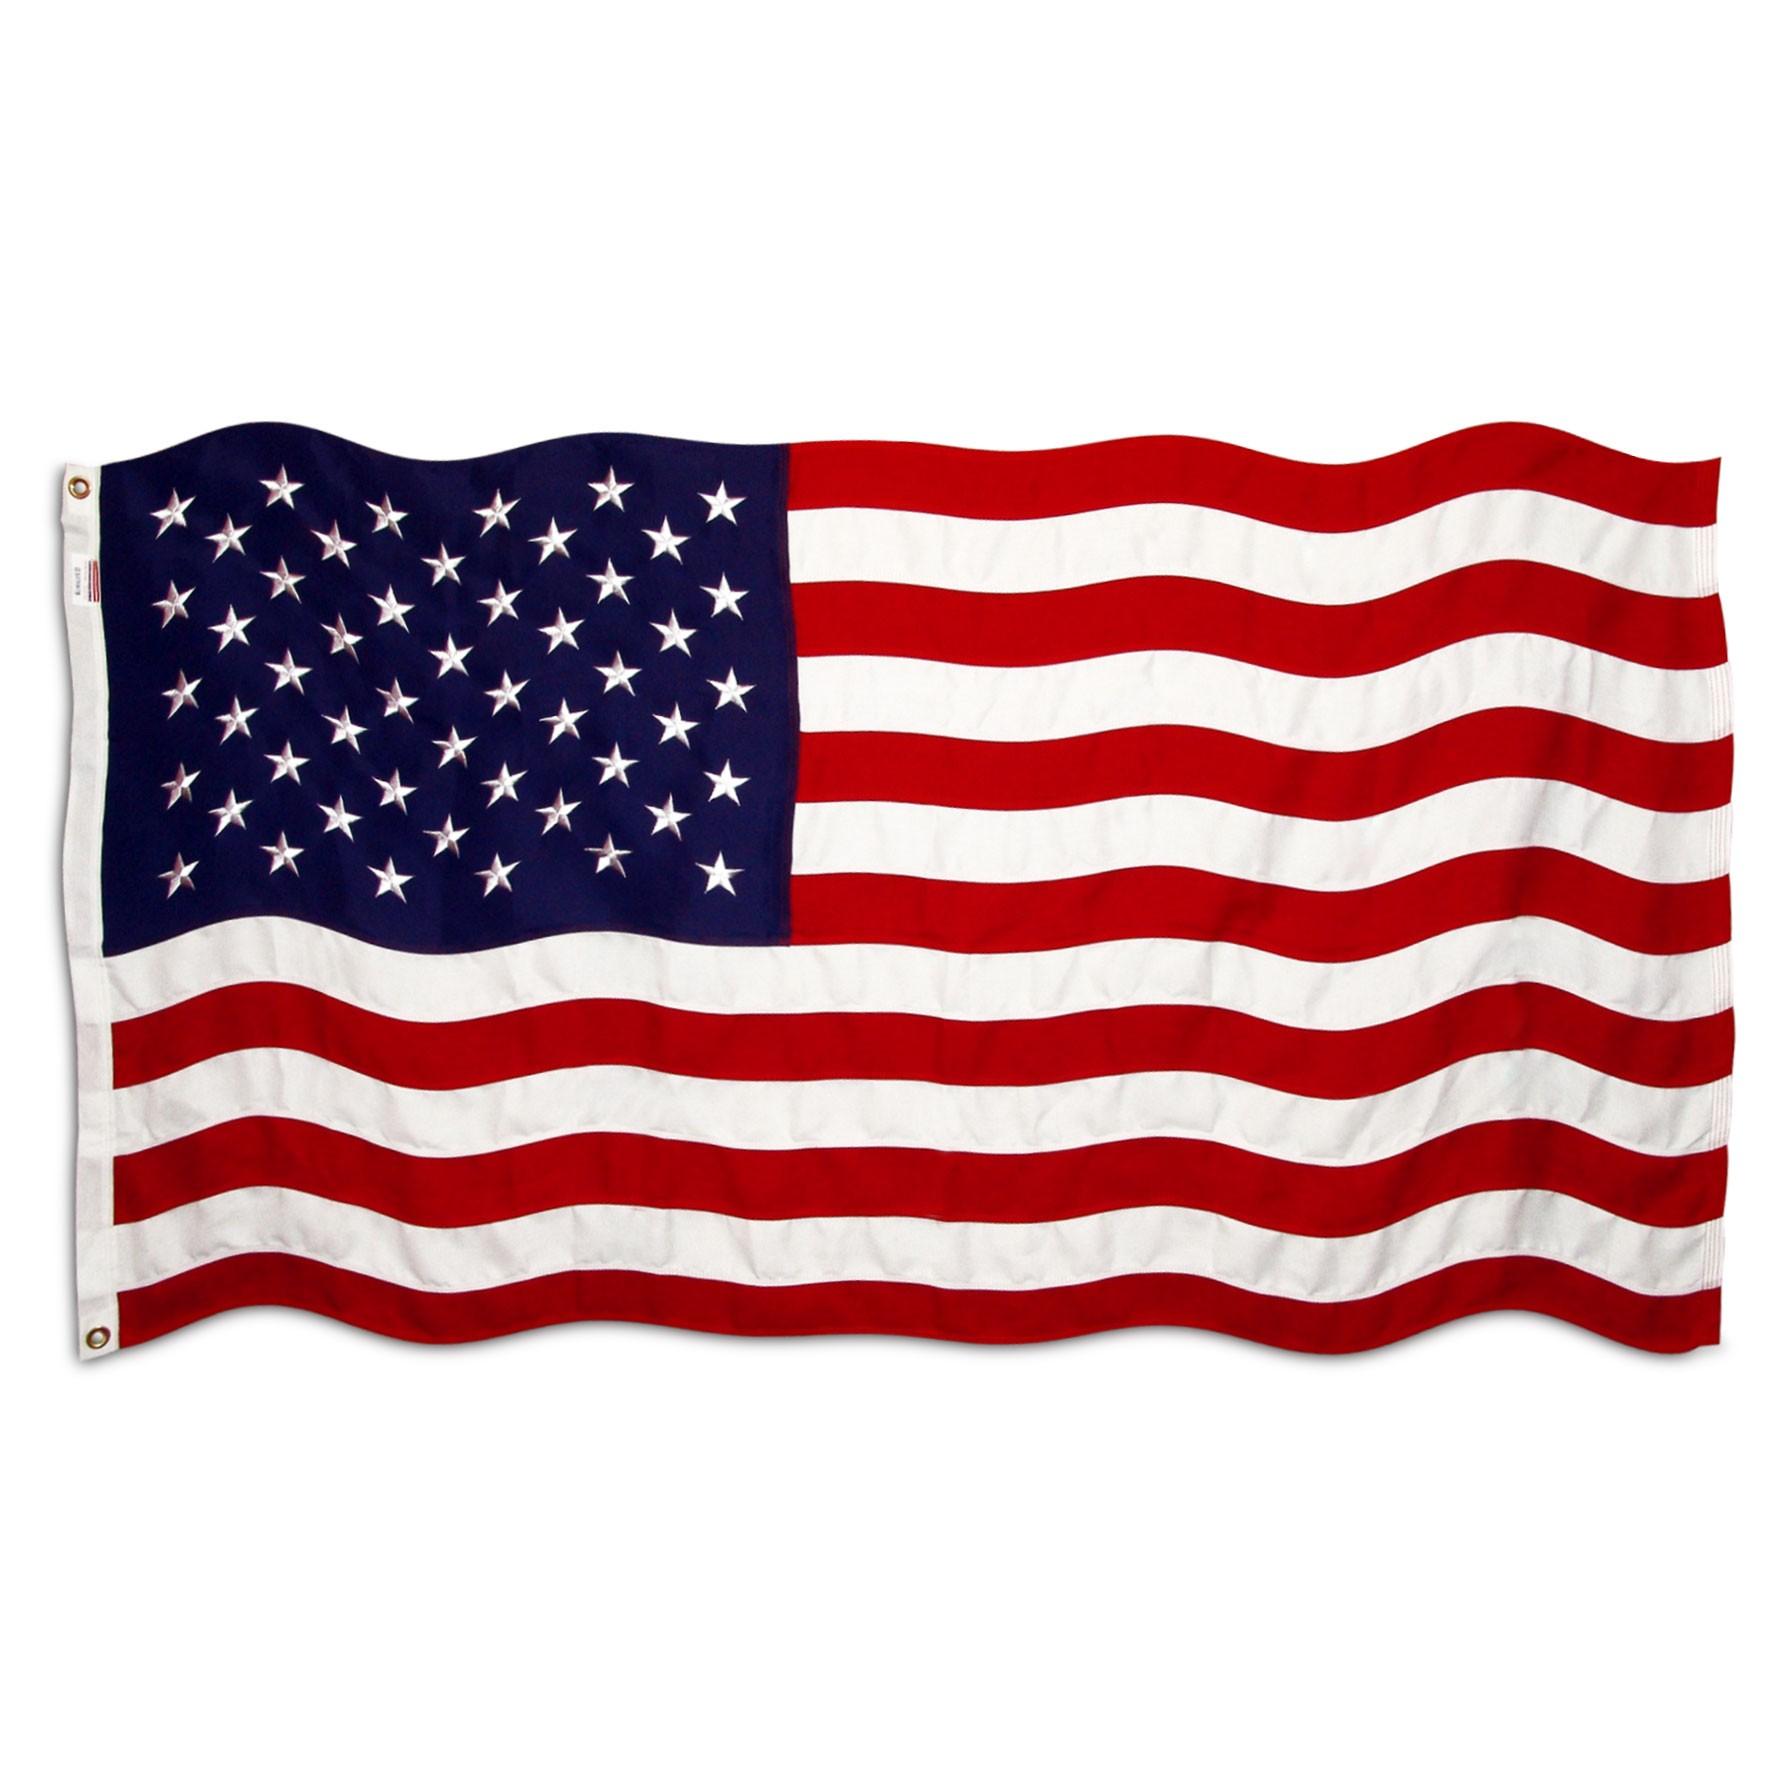 1784x1784 American Flag Clipart